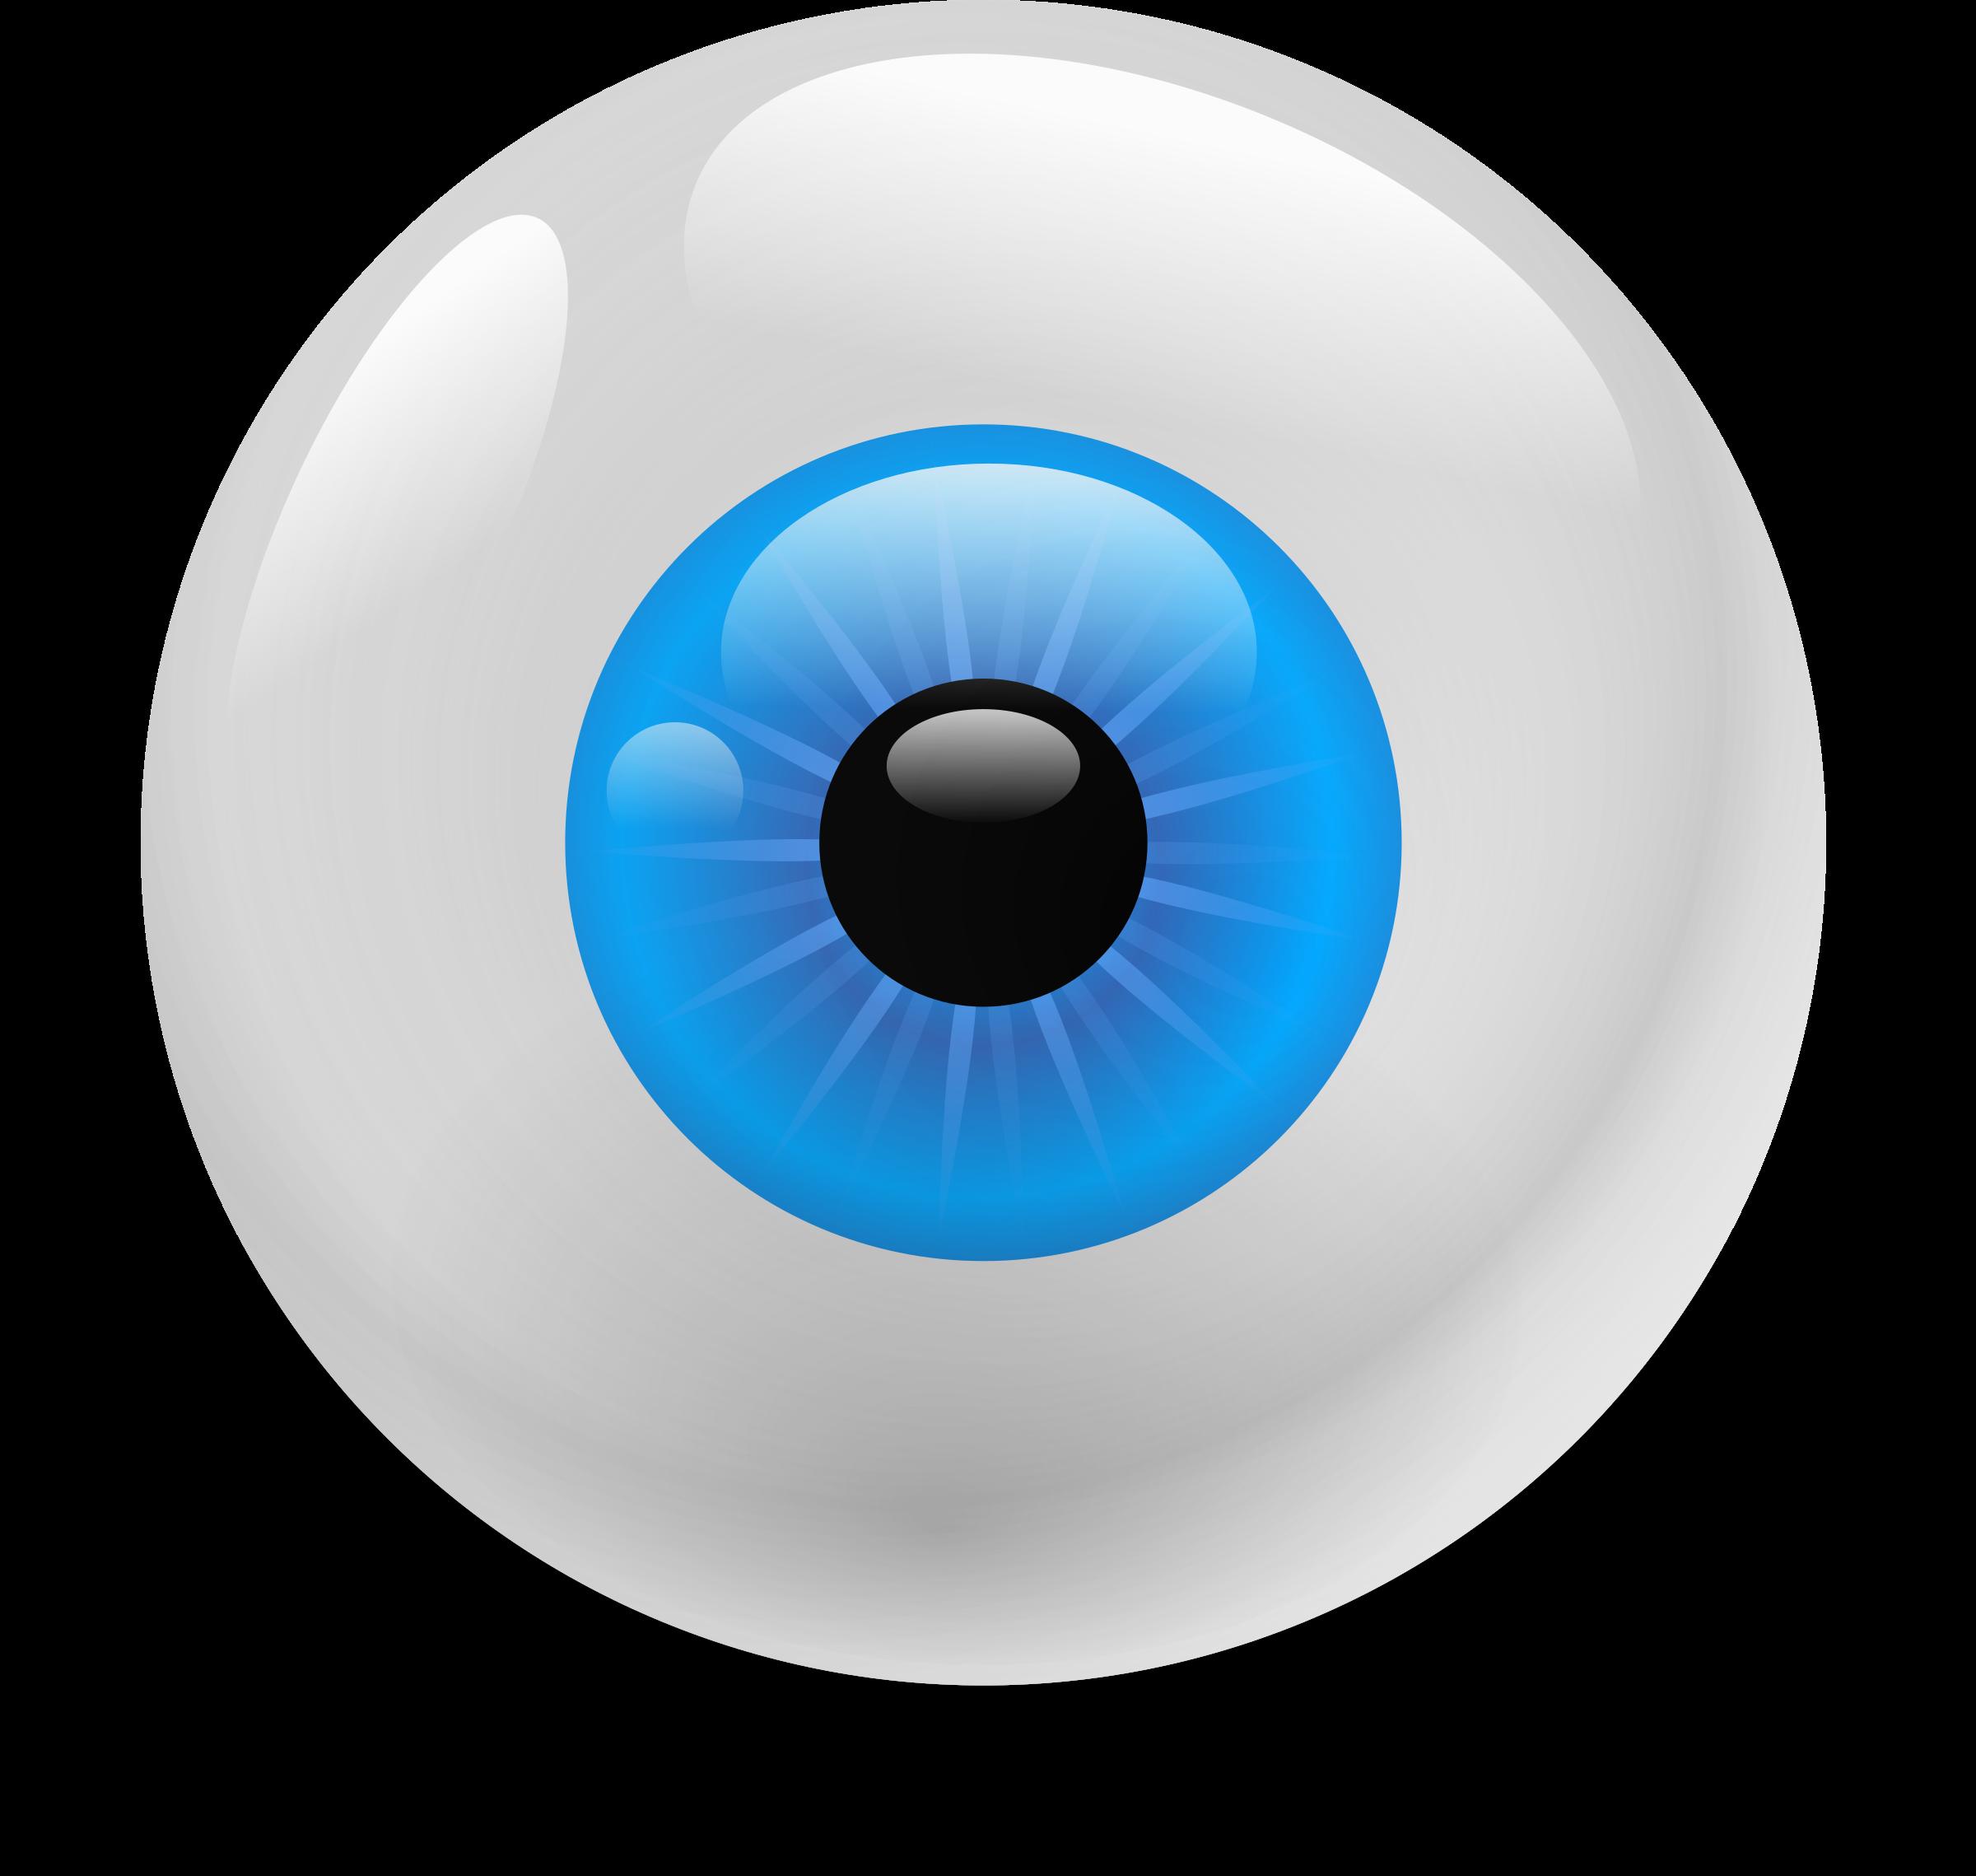 Eye Vector Png